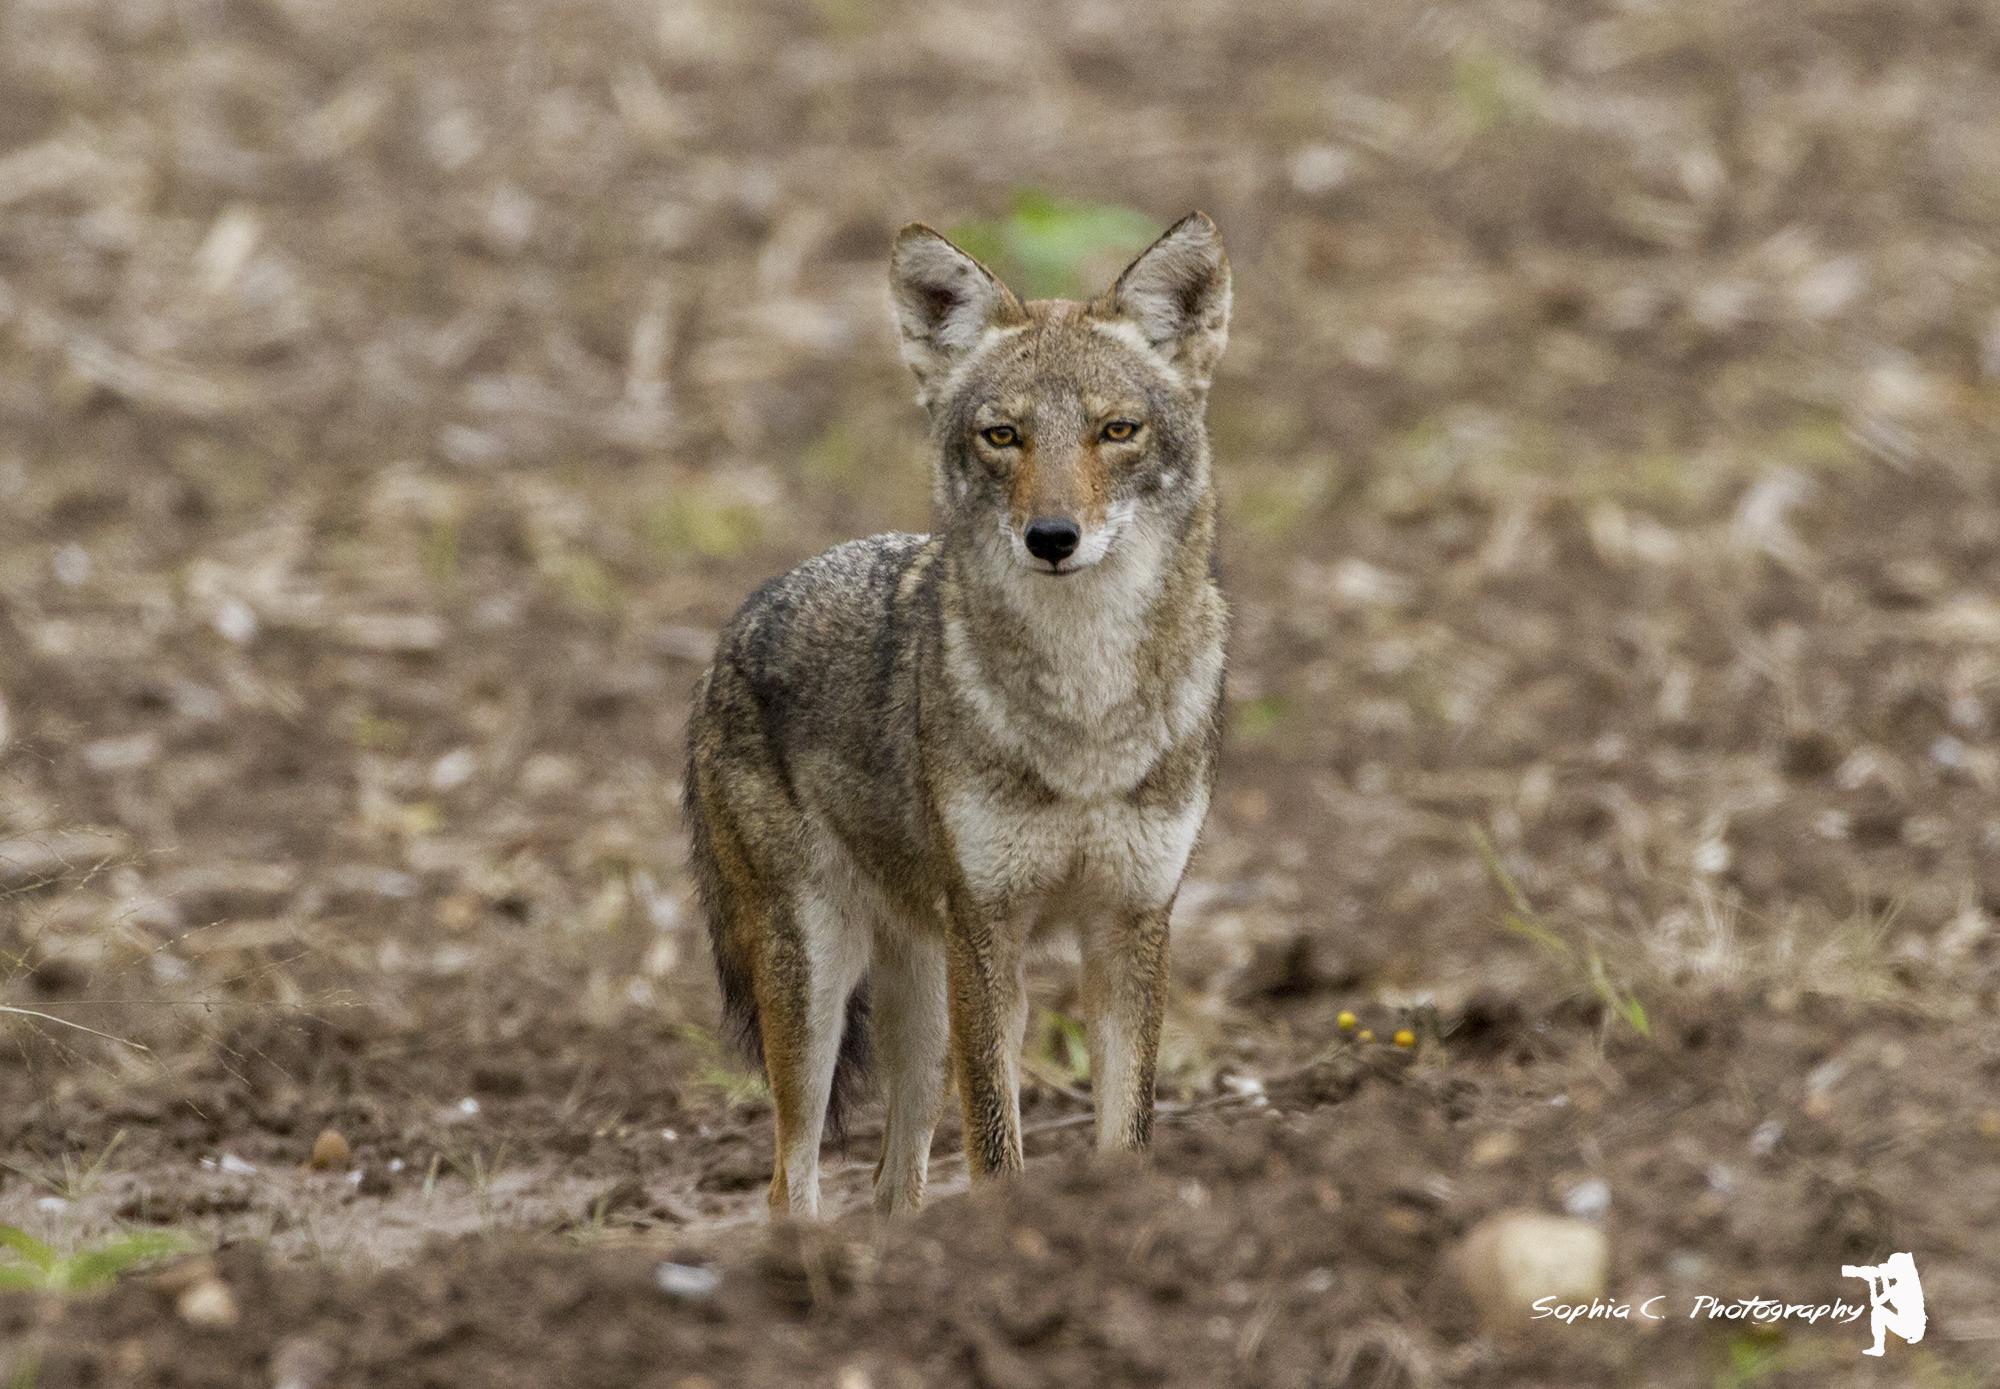 3. Coyote, off Bensten Rio Grande Valley State Park, Texas